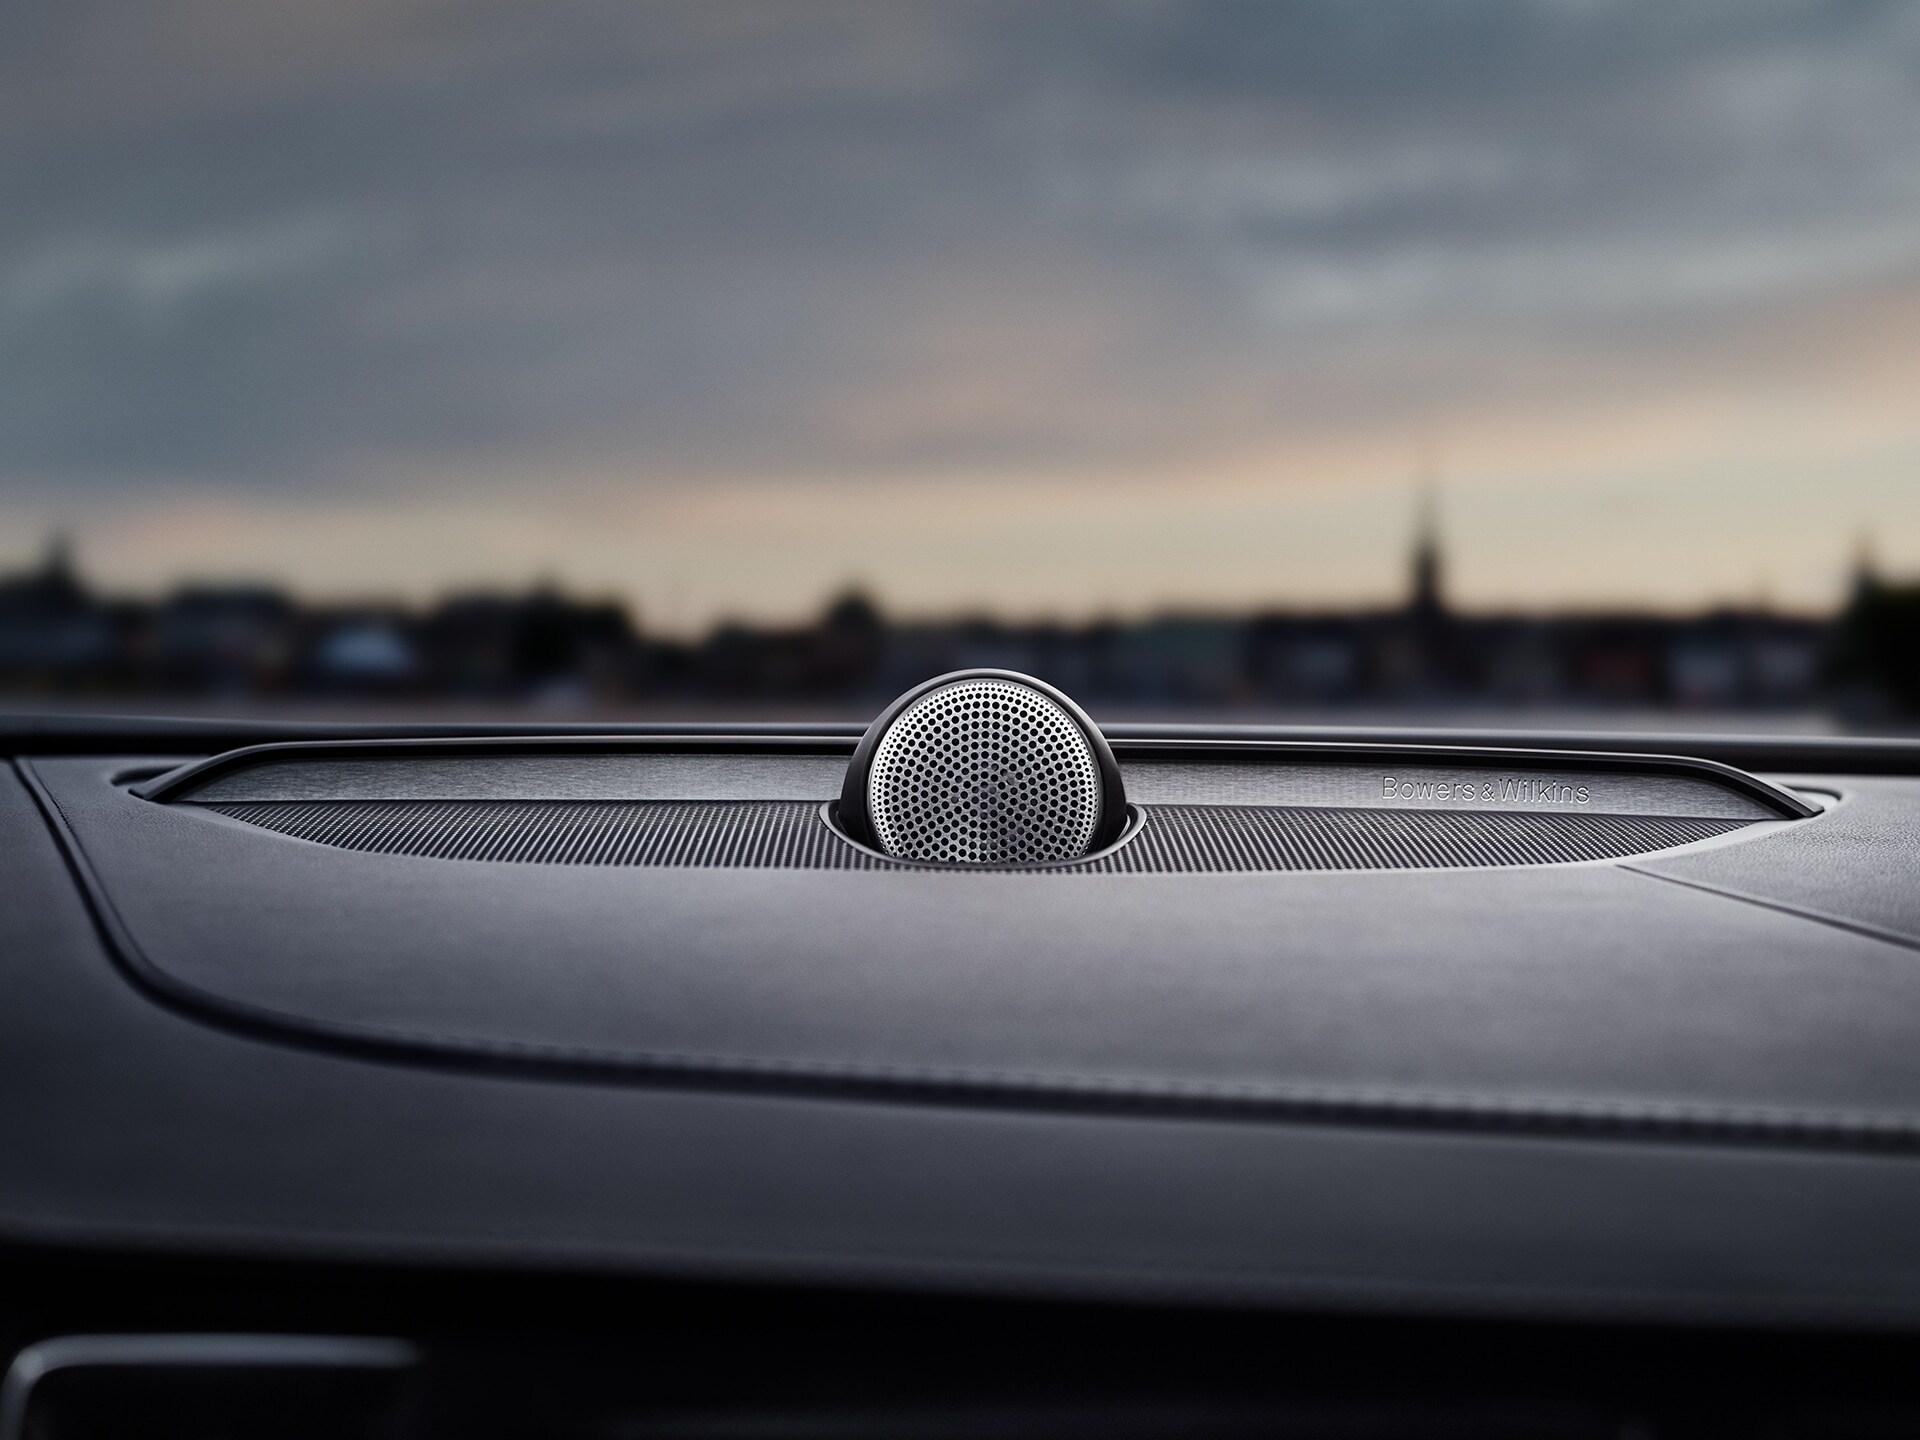 Hátalarar frá Bowers & Wilkins í innanrými Volvo XC90 Recharge